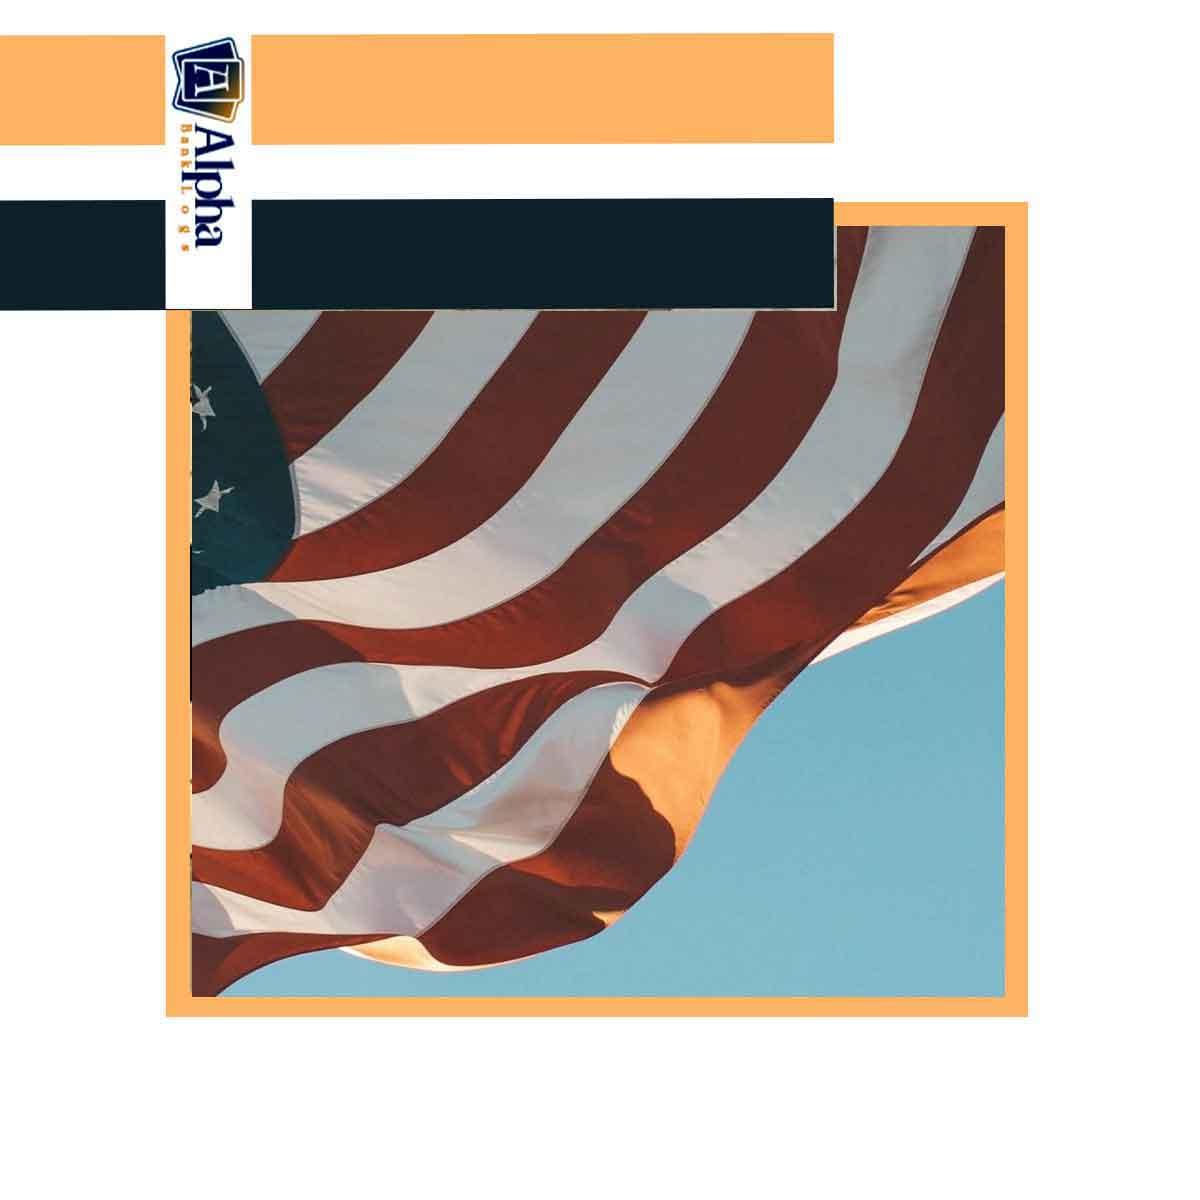 US dob+ssn CC Fullz(CVV) x 20 item pack